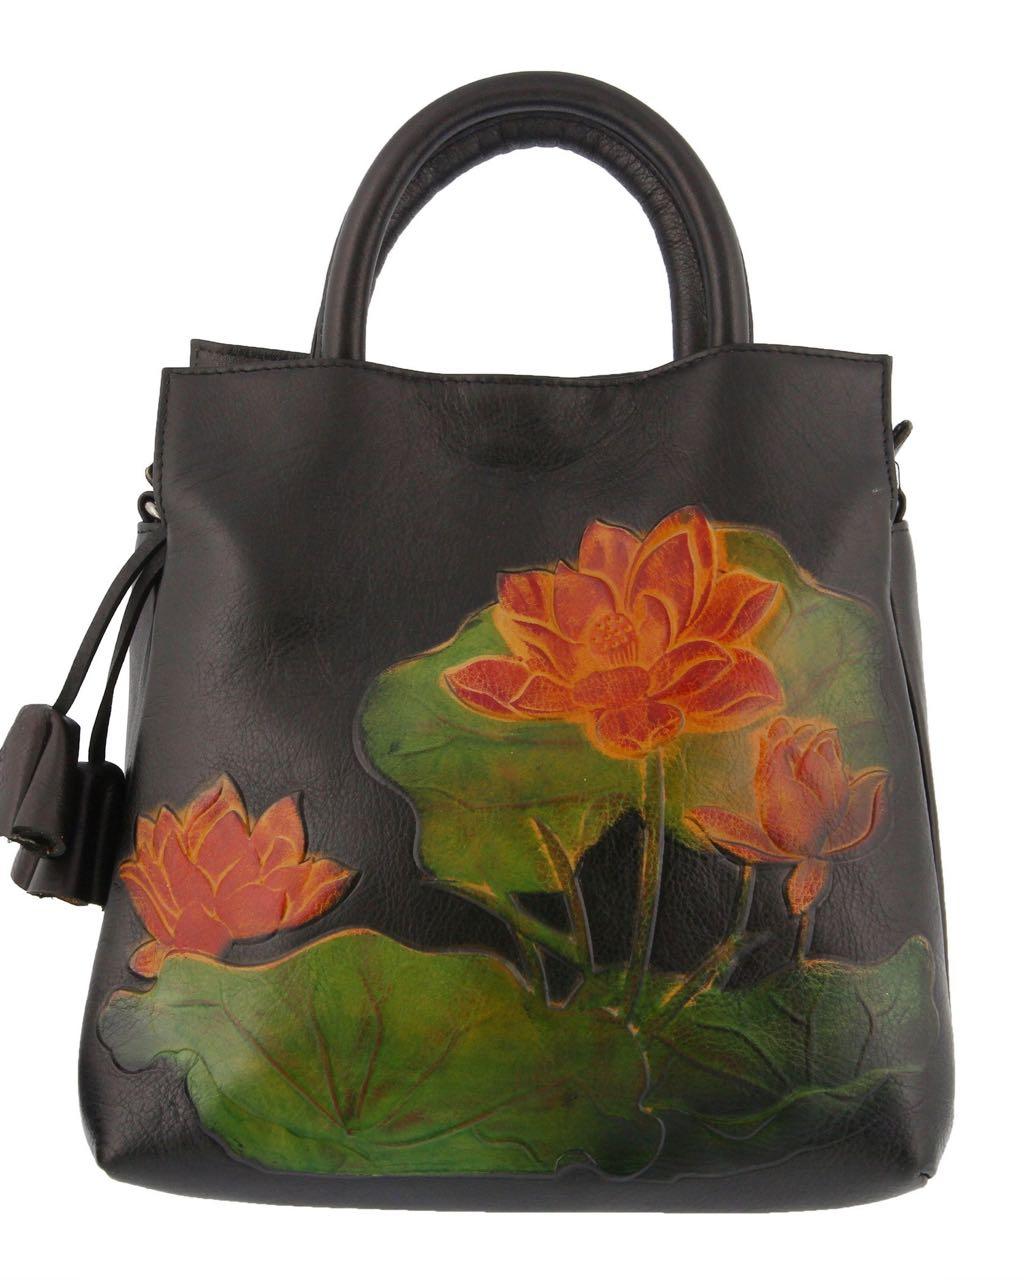 L'Artiste Bag Lilypad